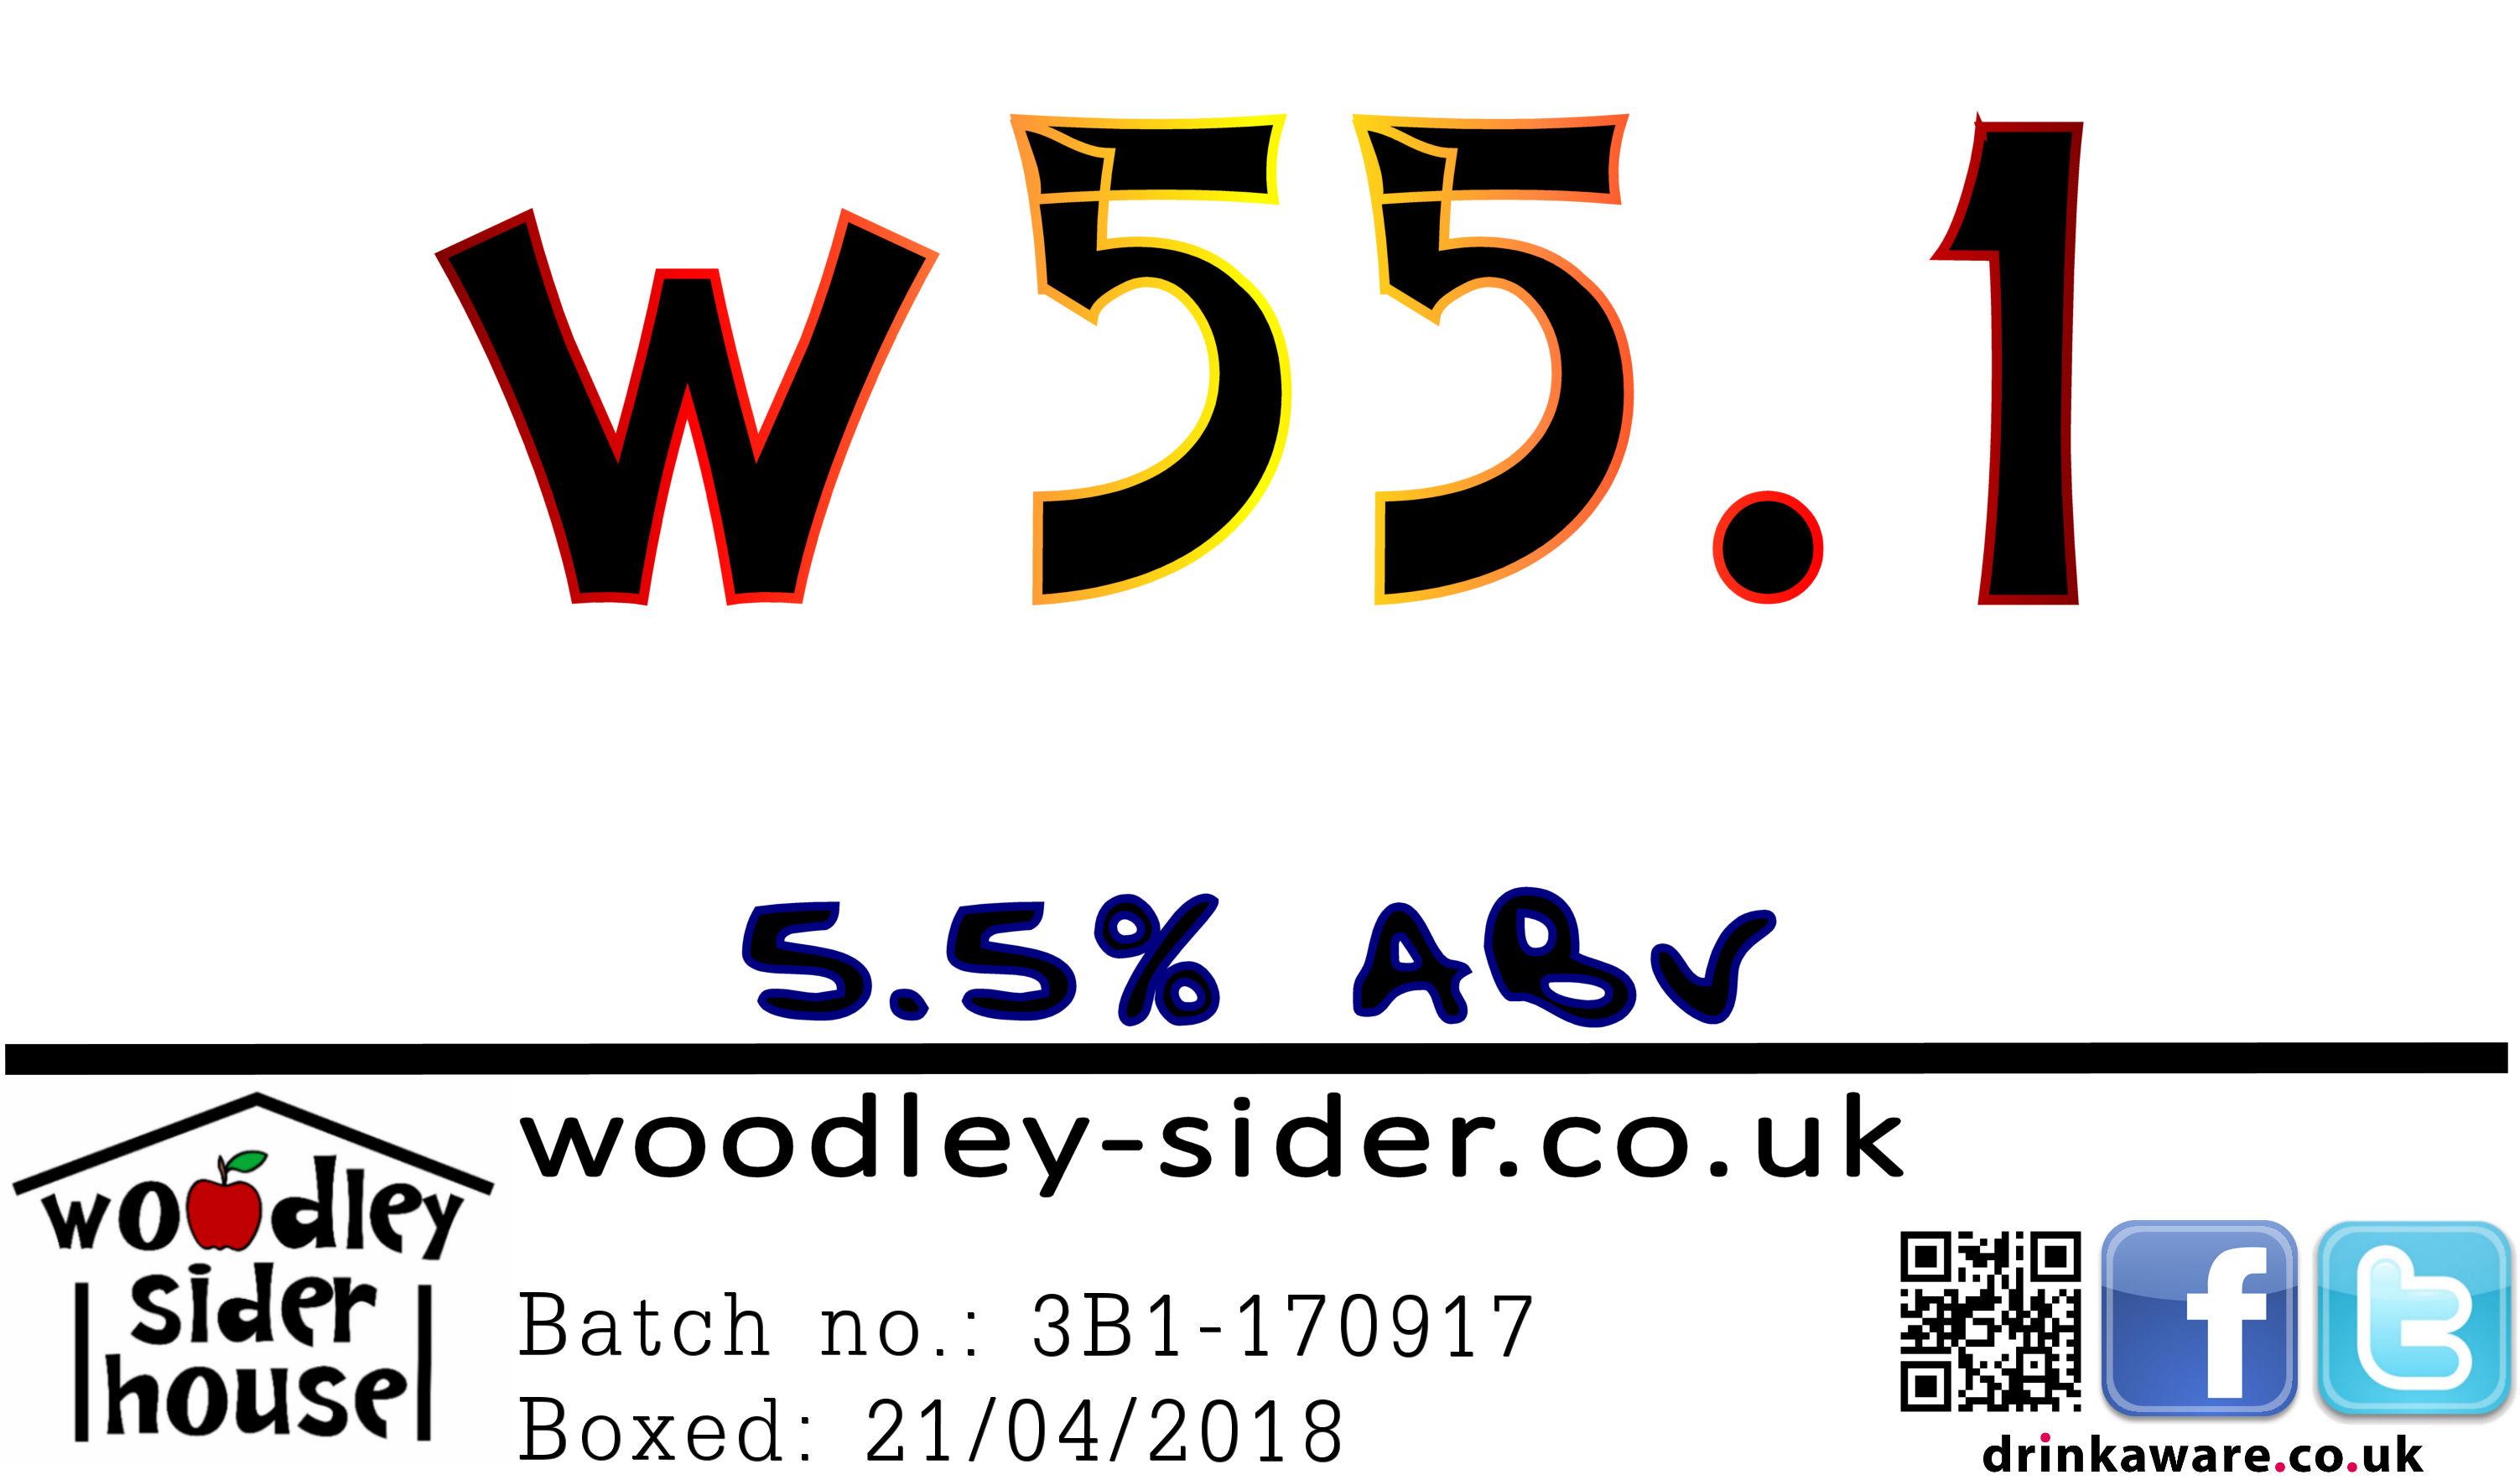 W55.1